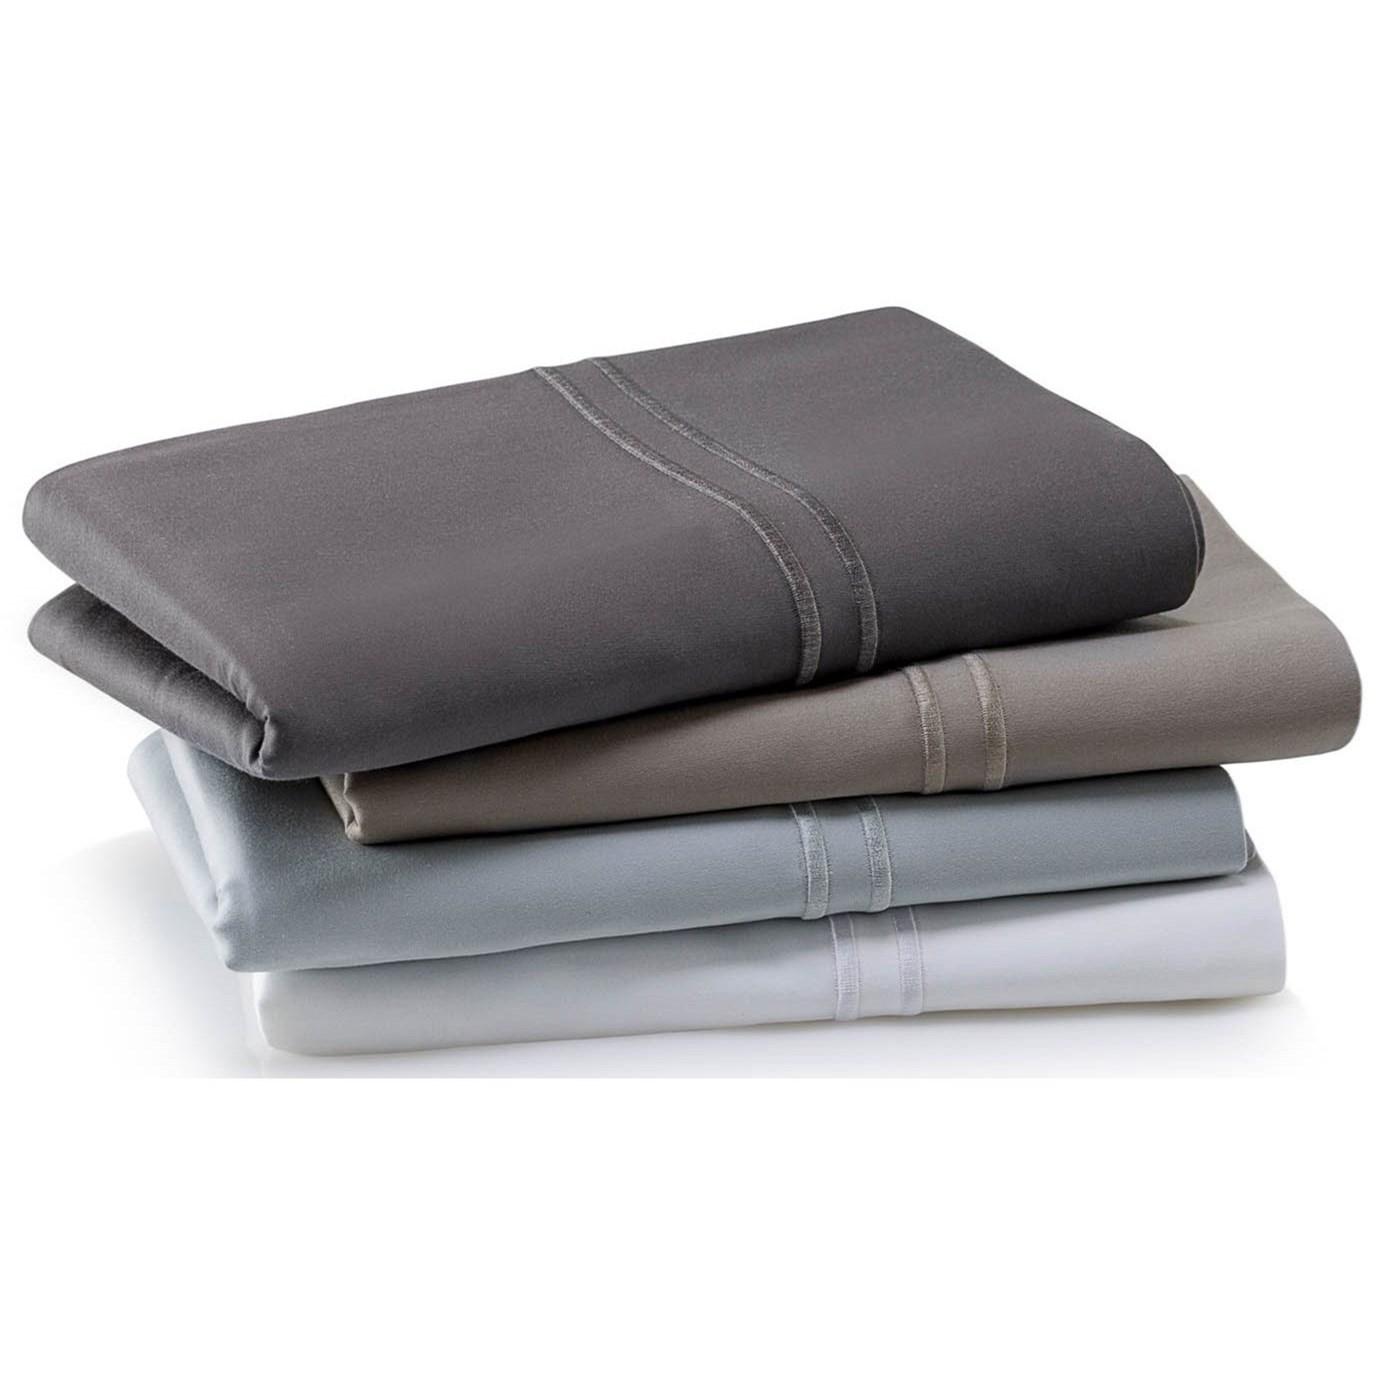 Supima Cotton Supima Cotton Sheets Split Cal King by Malouf at A1 Furniture & Mattress